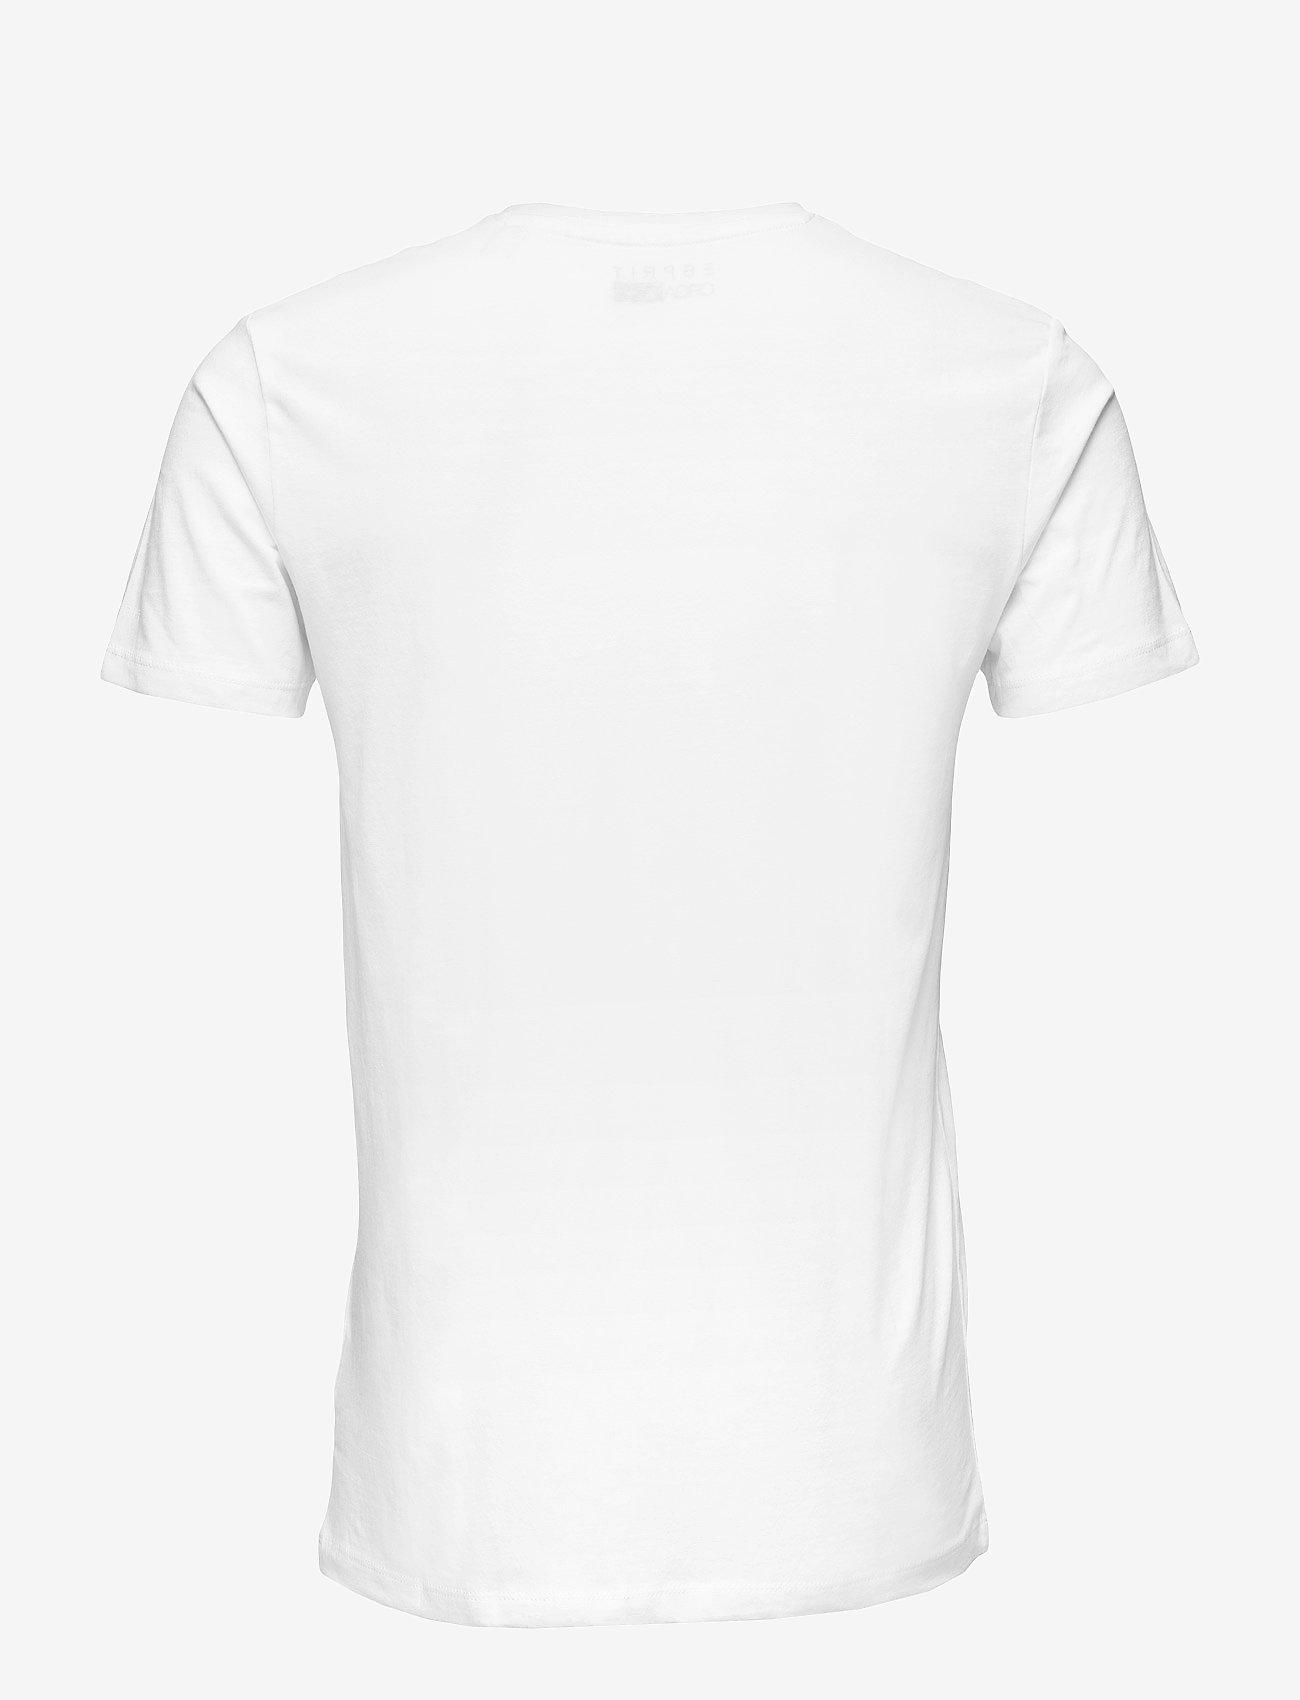 Esprit Casual - T-Shirts - korte mouwen - white - 1